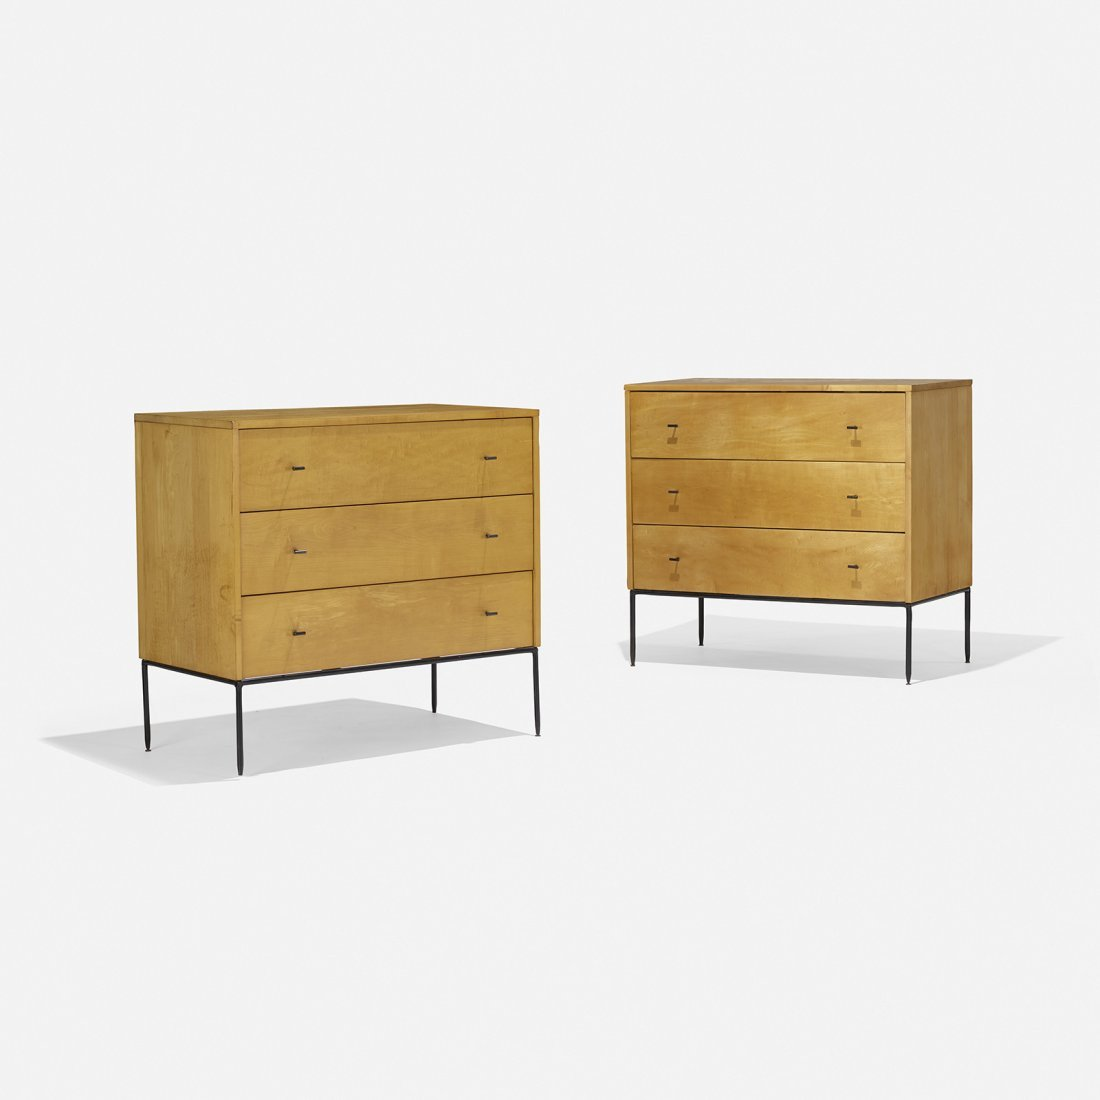 Paul McCobb, Planner Group cabinets, model 1508-9, pair